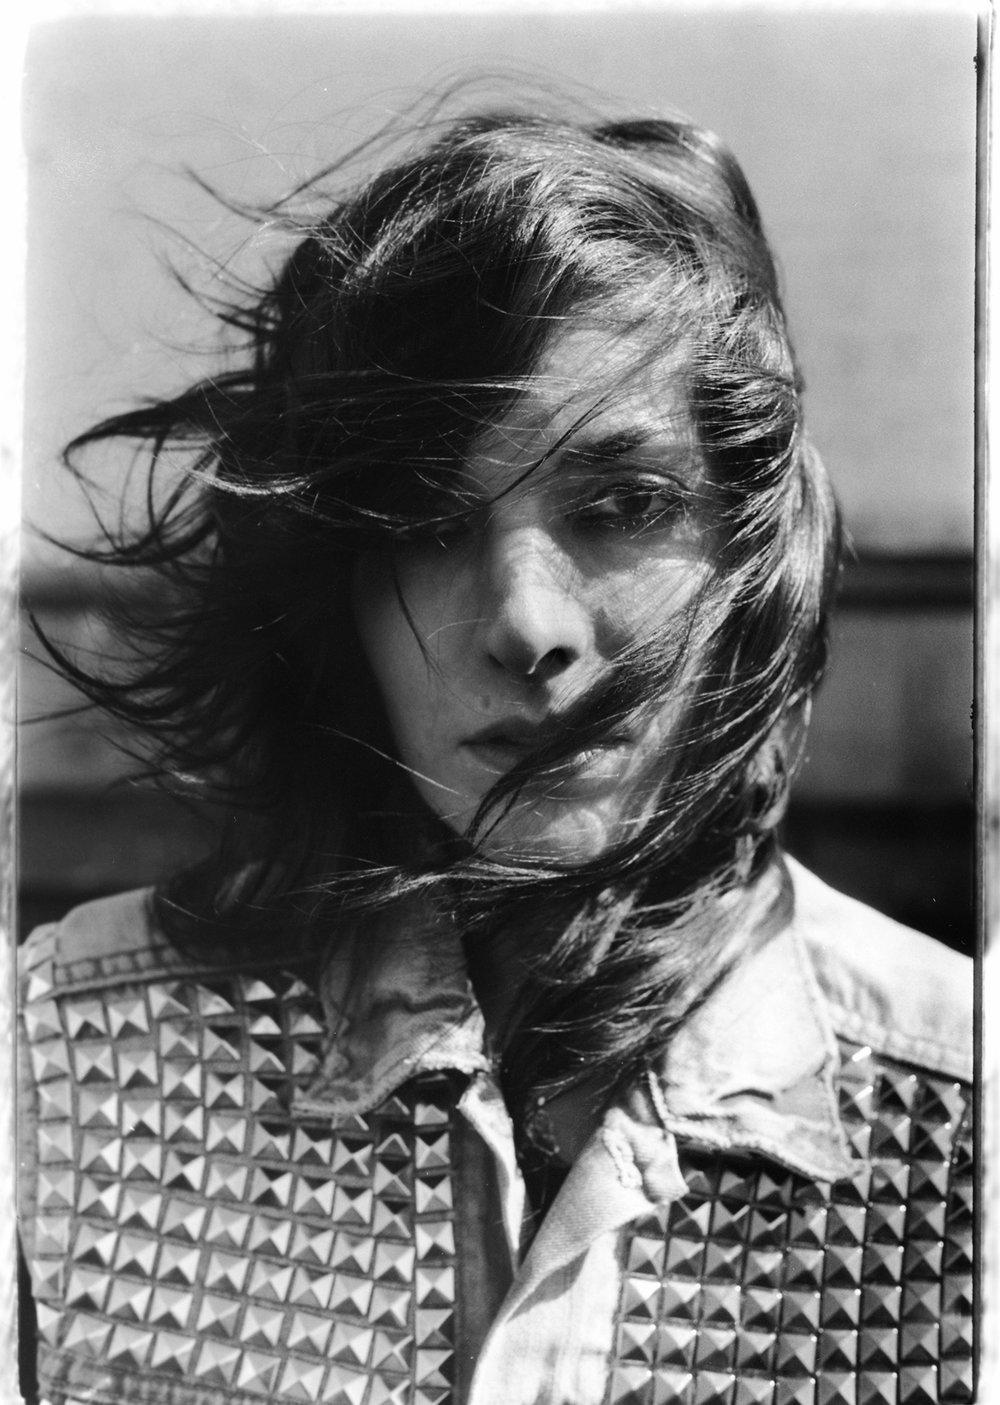 Deborah-Cohen-Sadmag-cover-darkroomprint.jpg